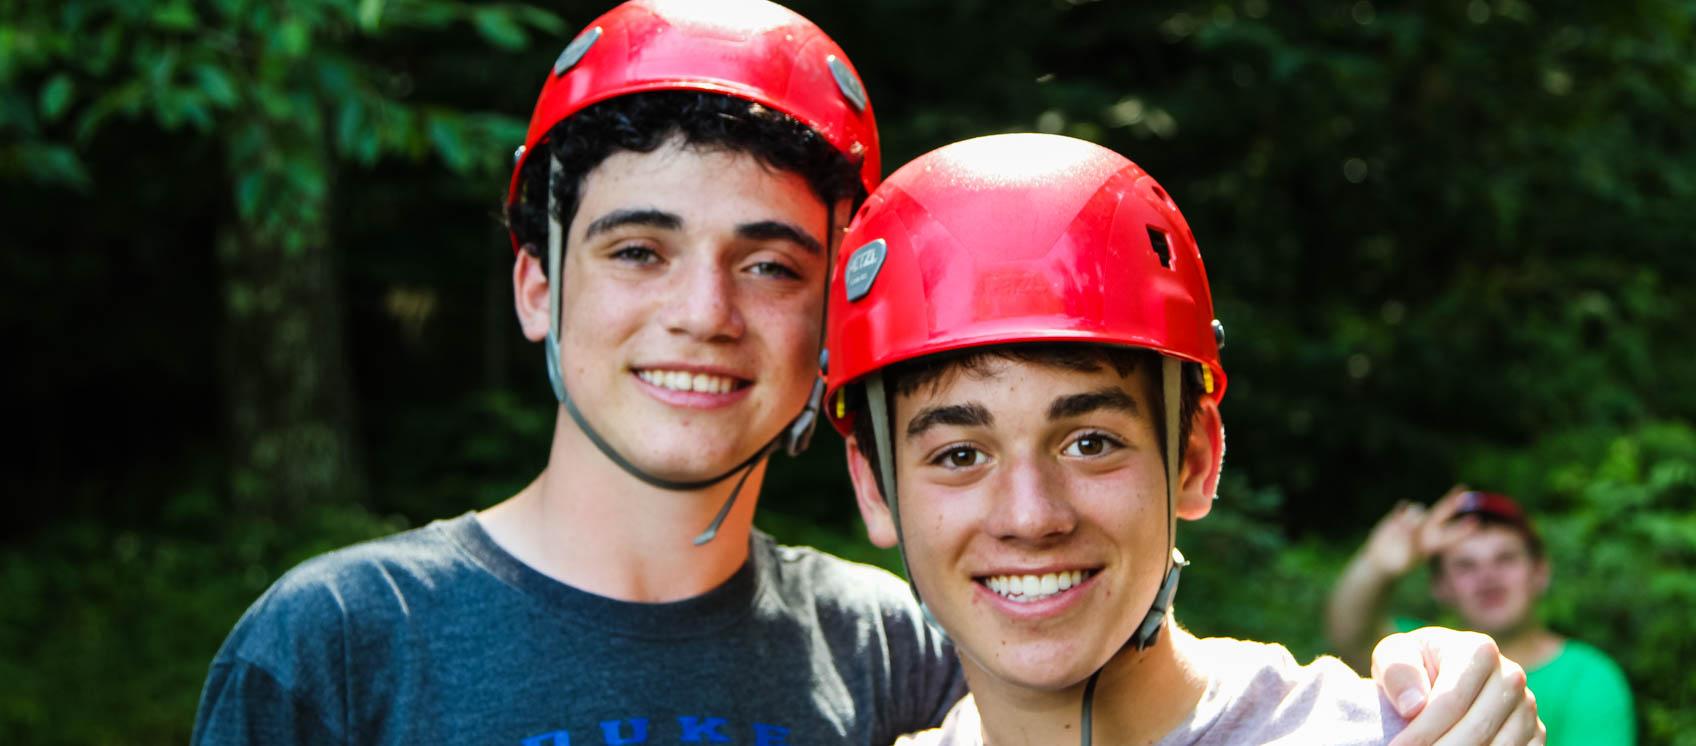 climbing-helmets